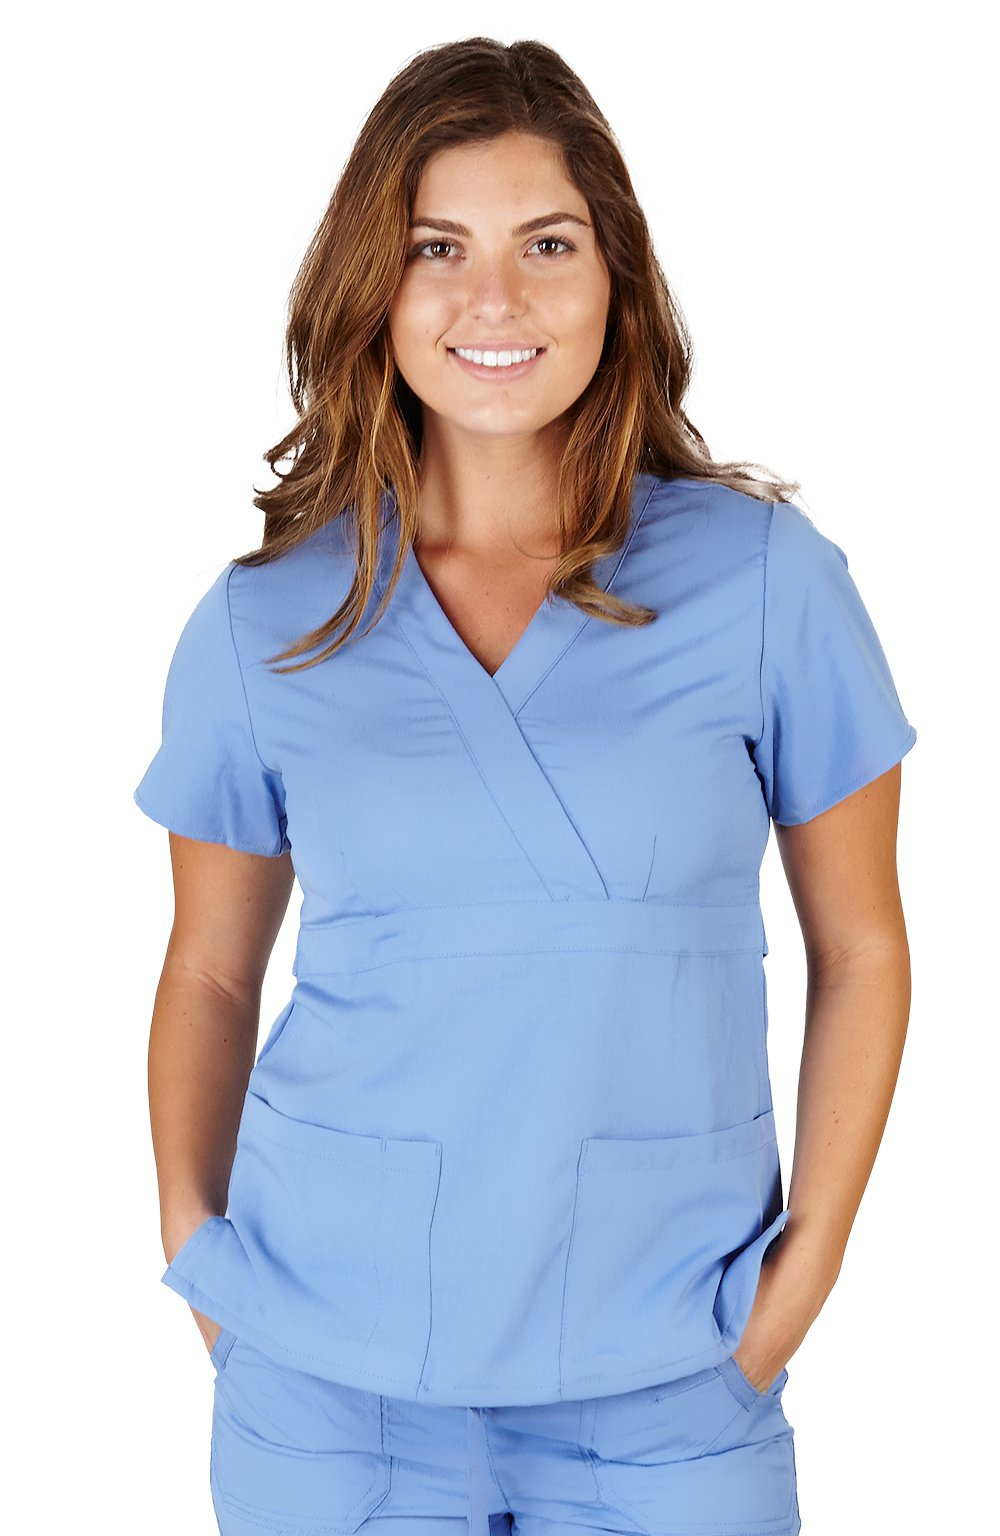 Ultra Soft Brand Scrubs - Premium Womens Junior Fit 3 Pocket Mock Wrap Scrub Top, Ceil Blue 36143-X-Small